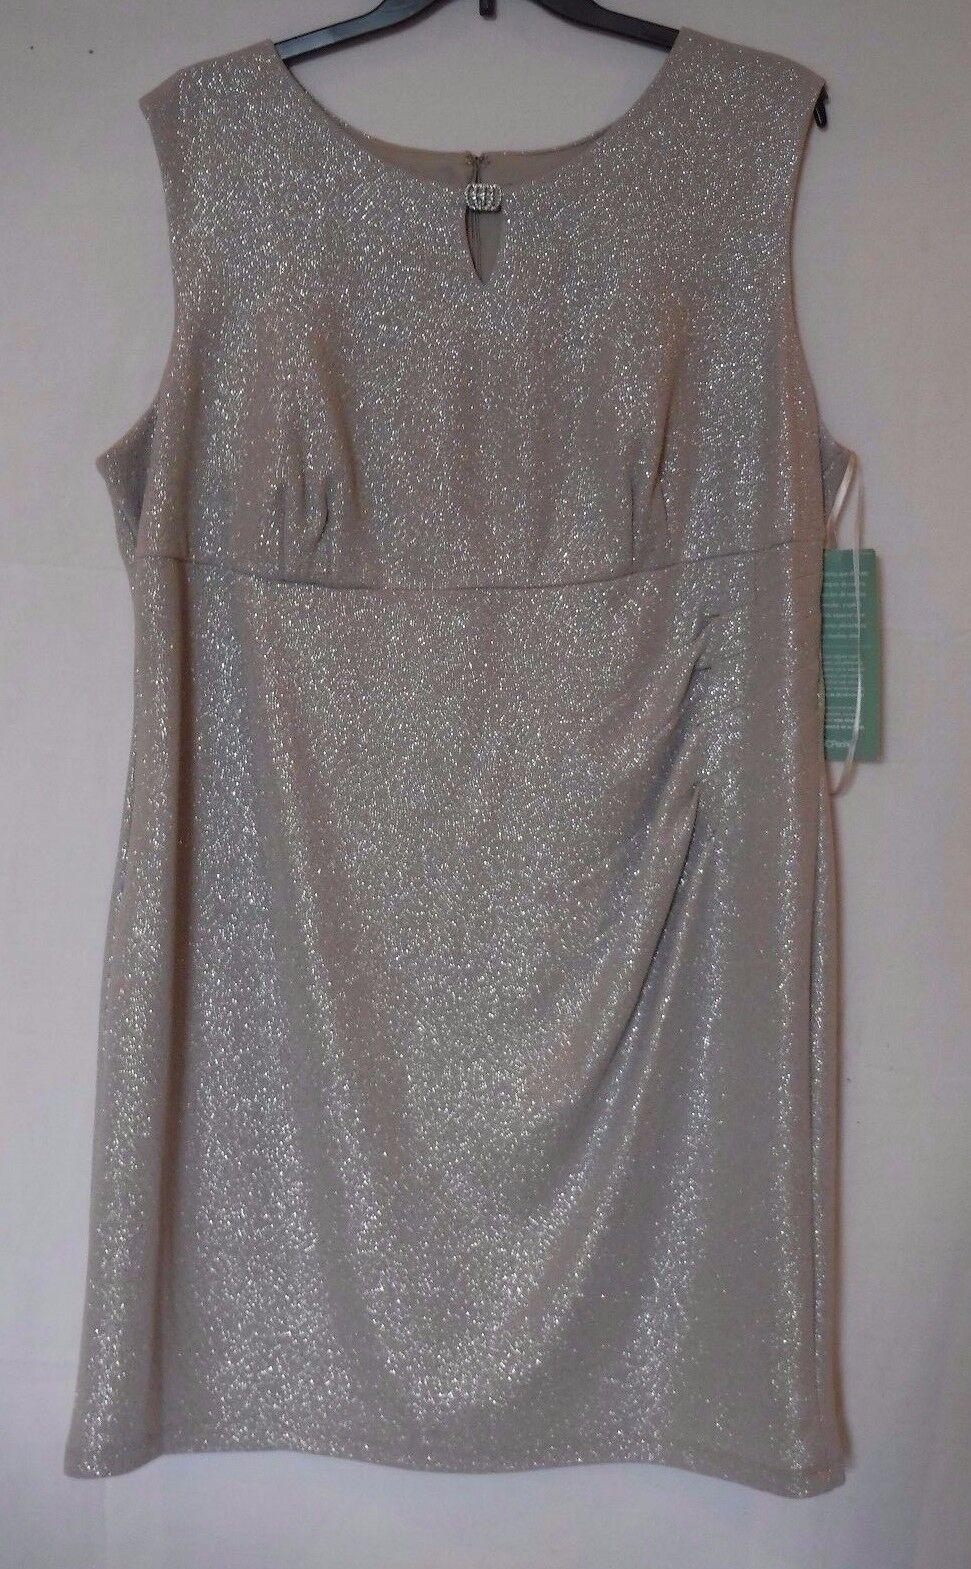 cbe0779aa229a Scarlett Sleeveless Side-ruched Metallic Dress Plus 24w Taupe ...